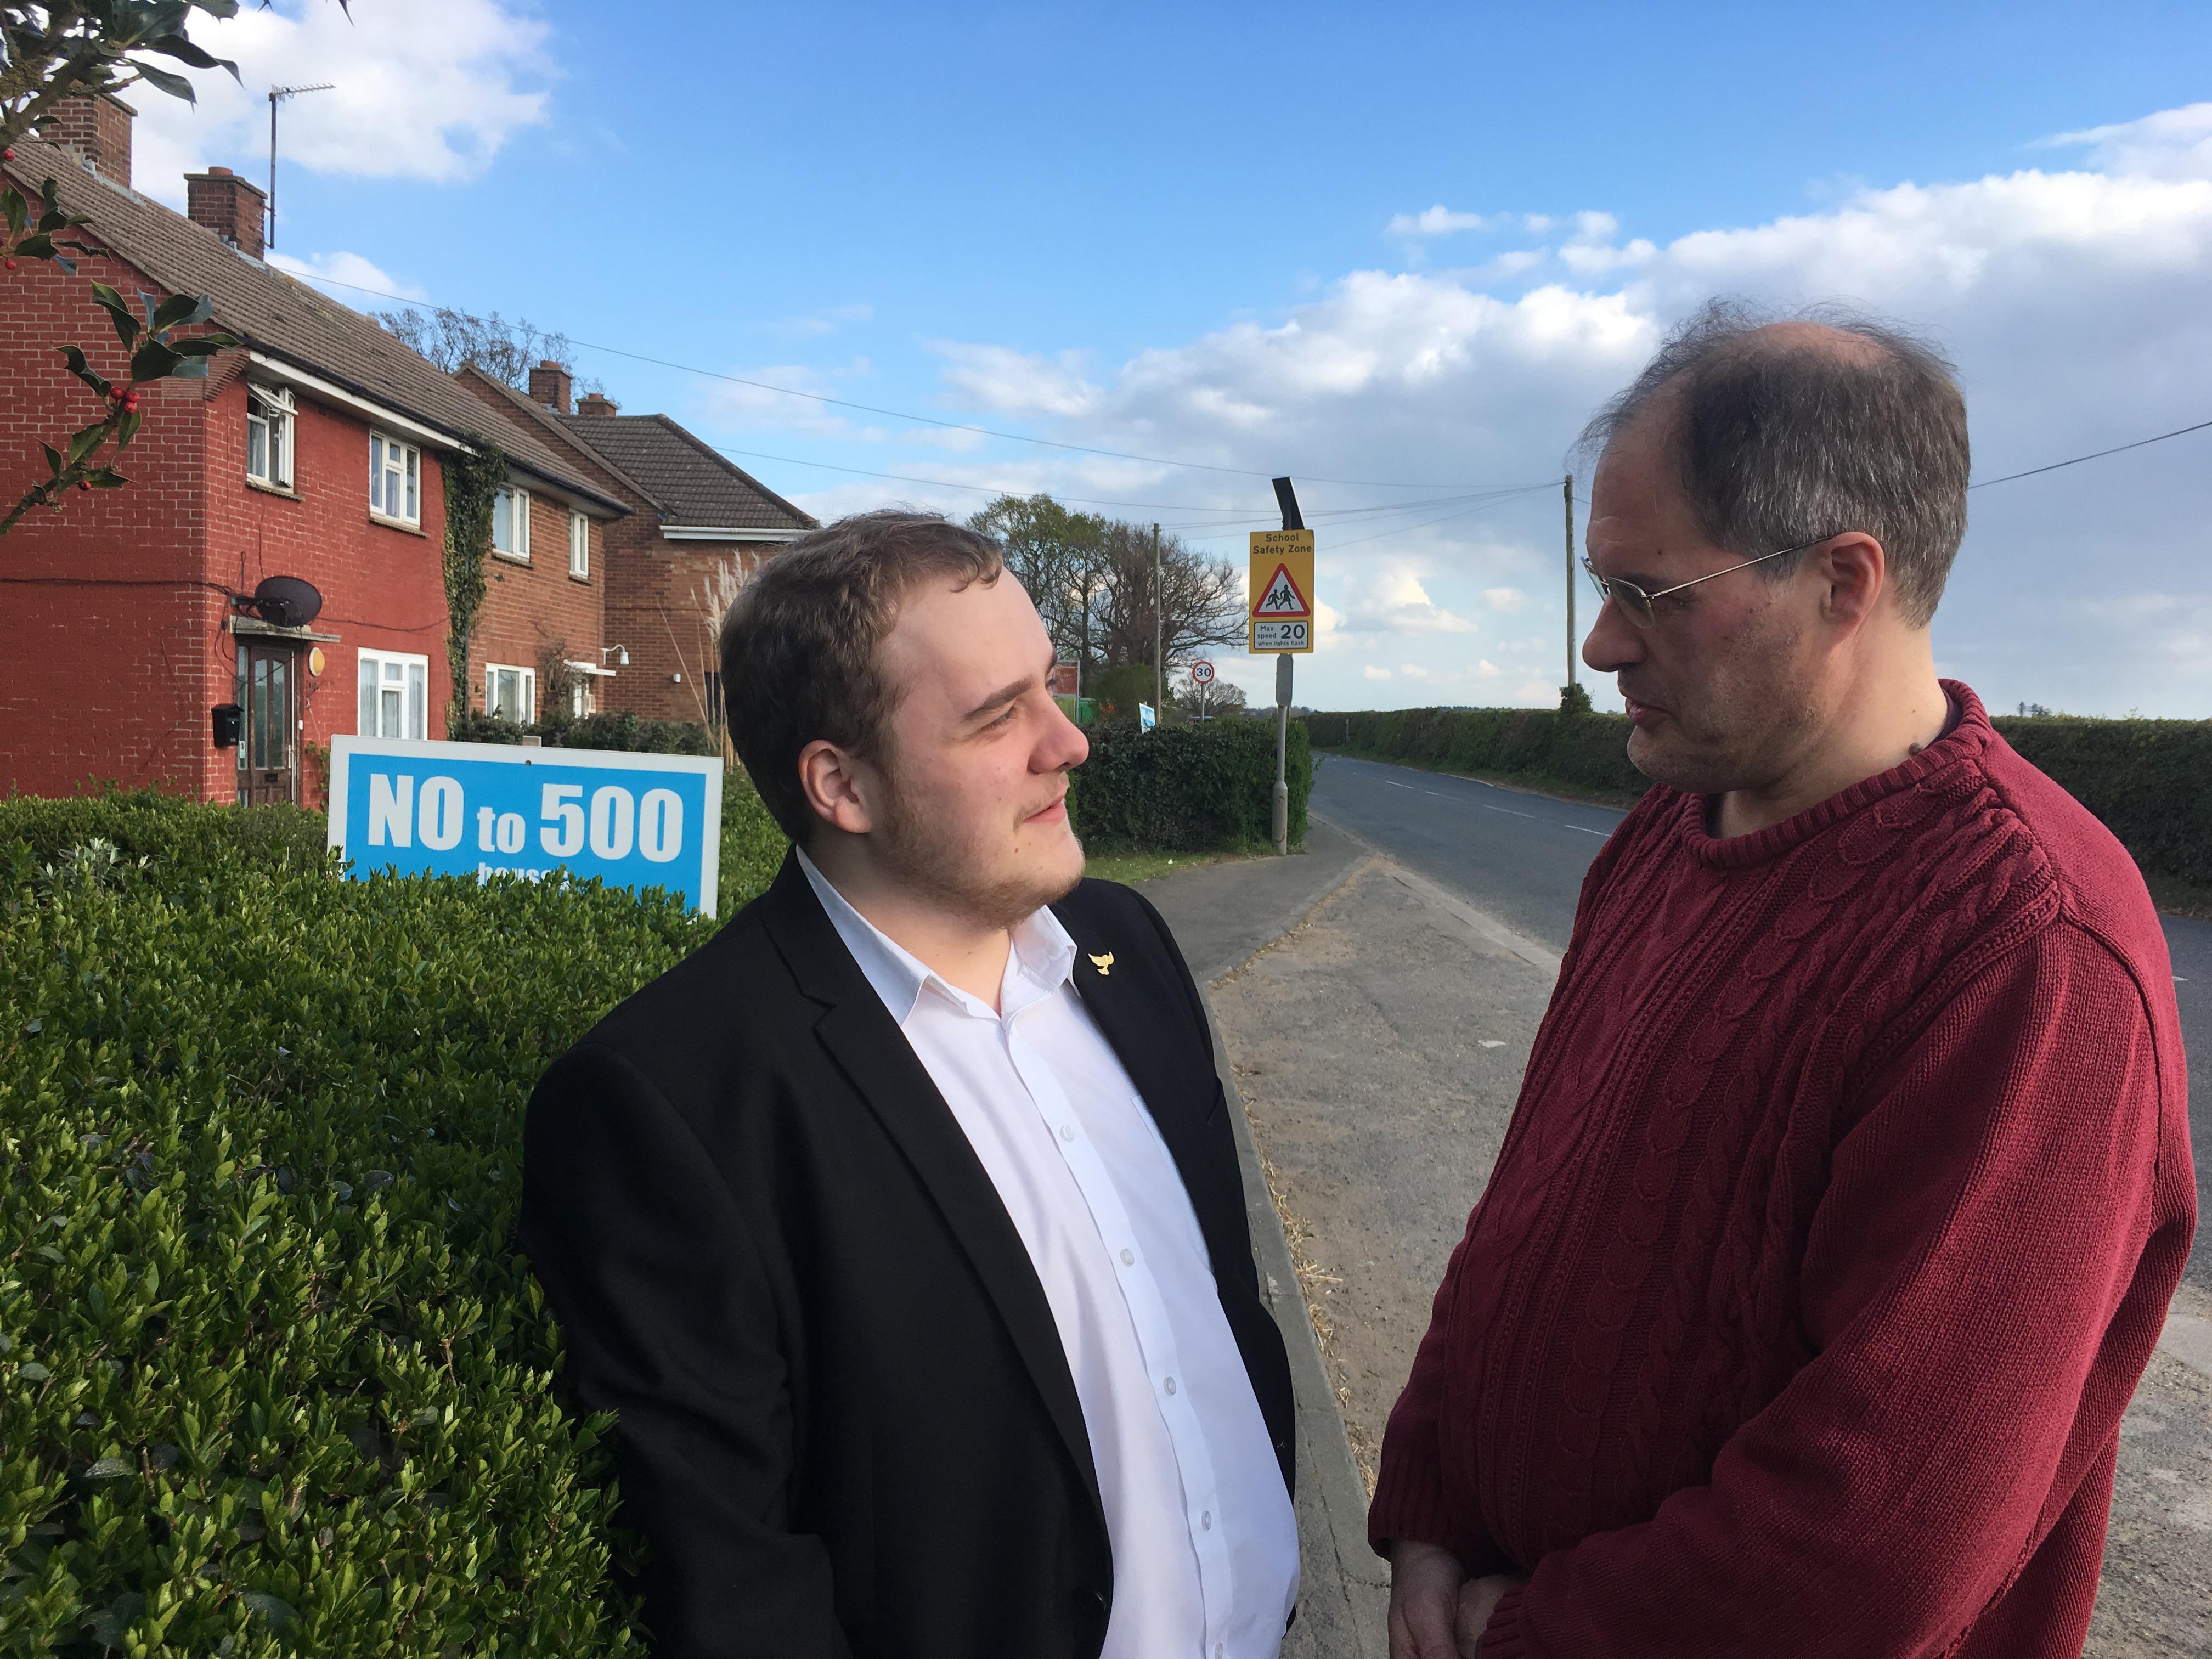 Connor Docwra and Rupert Moss-Eccardt